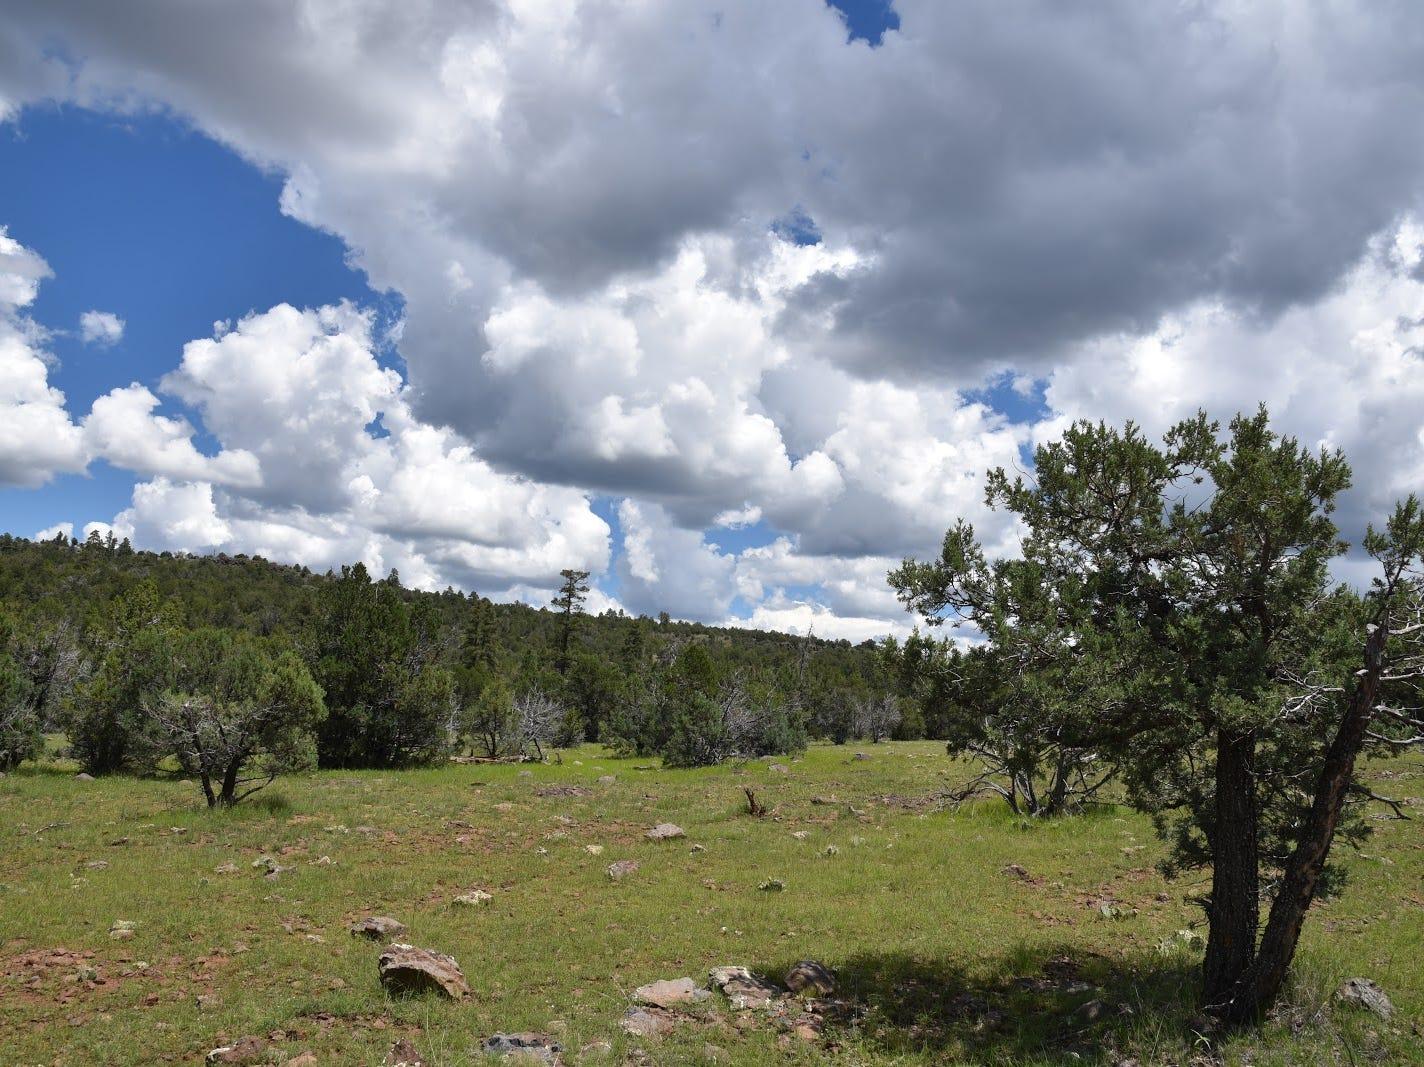 Monsoon clouds build above Wild Steer Mesa.